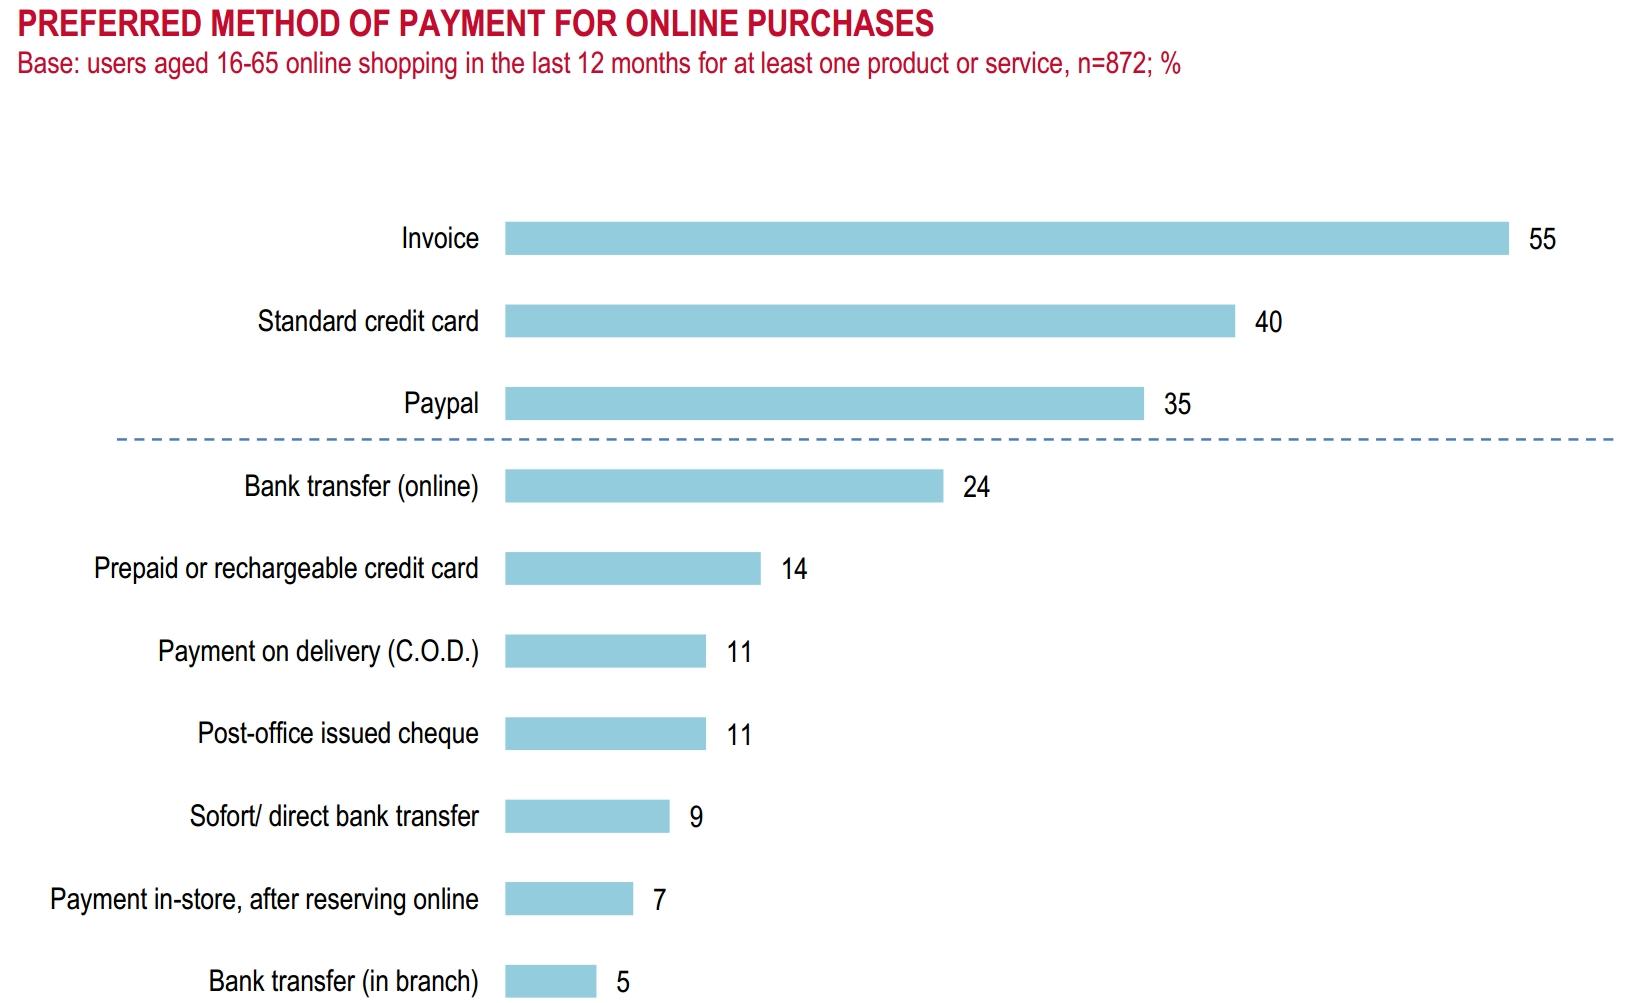 Preferred payment methods in ecommerce industry Switzerland